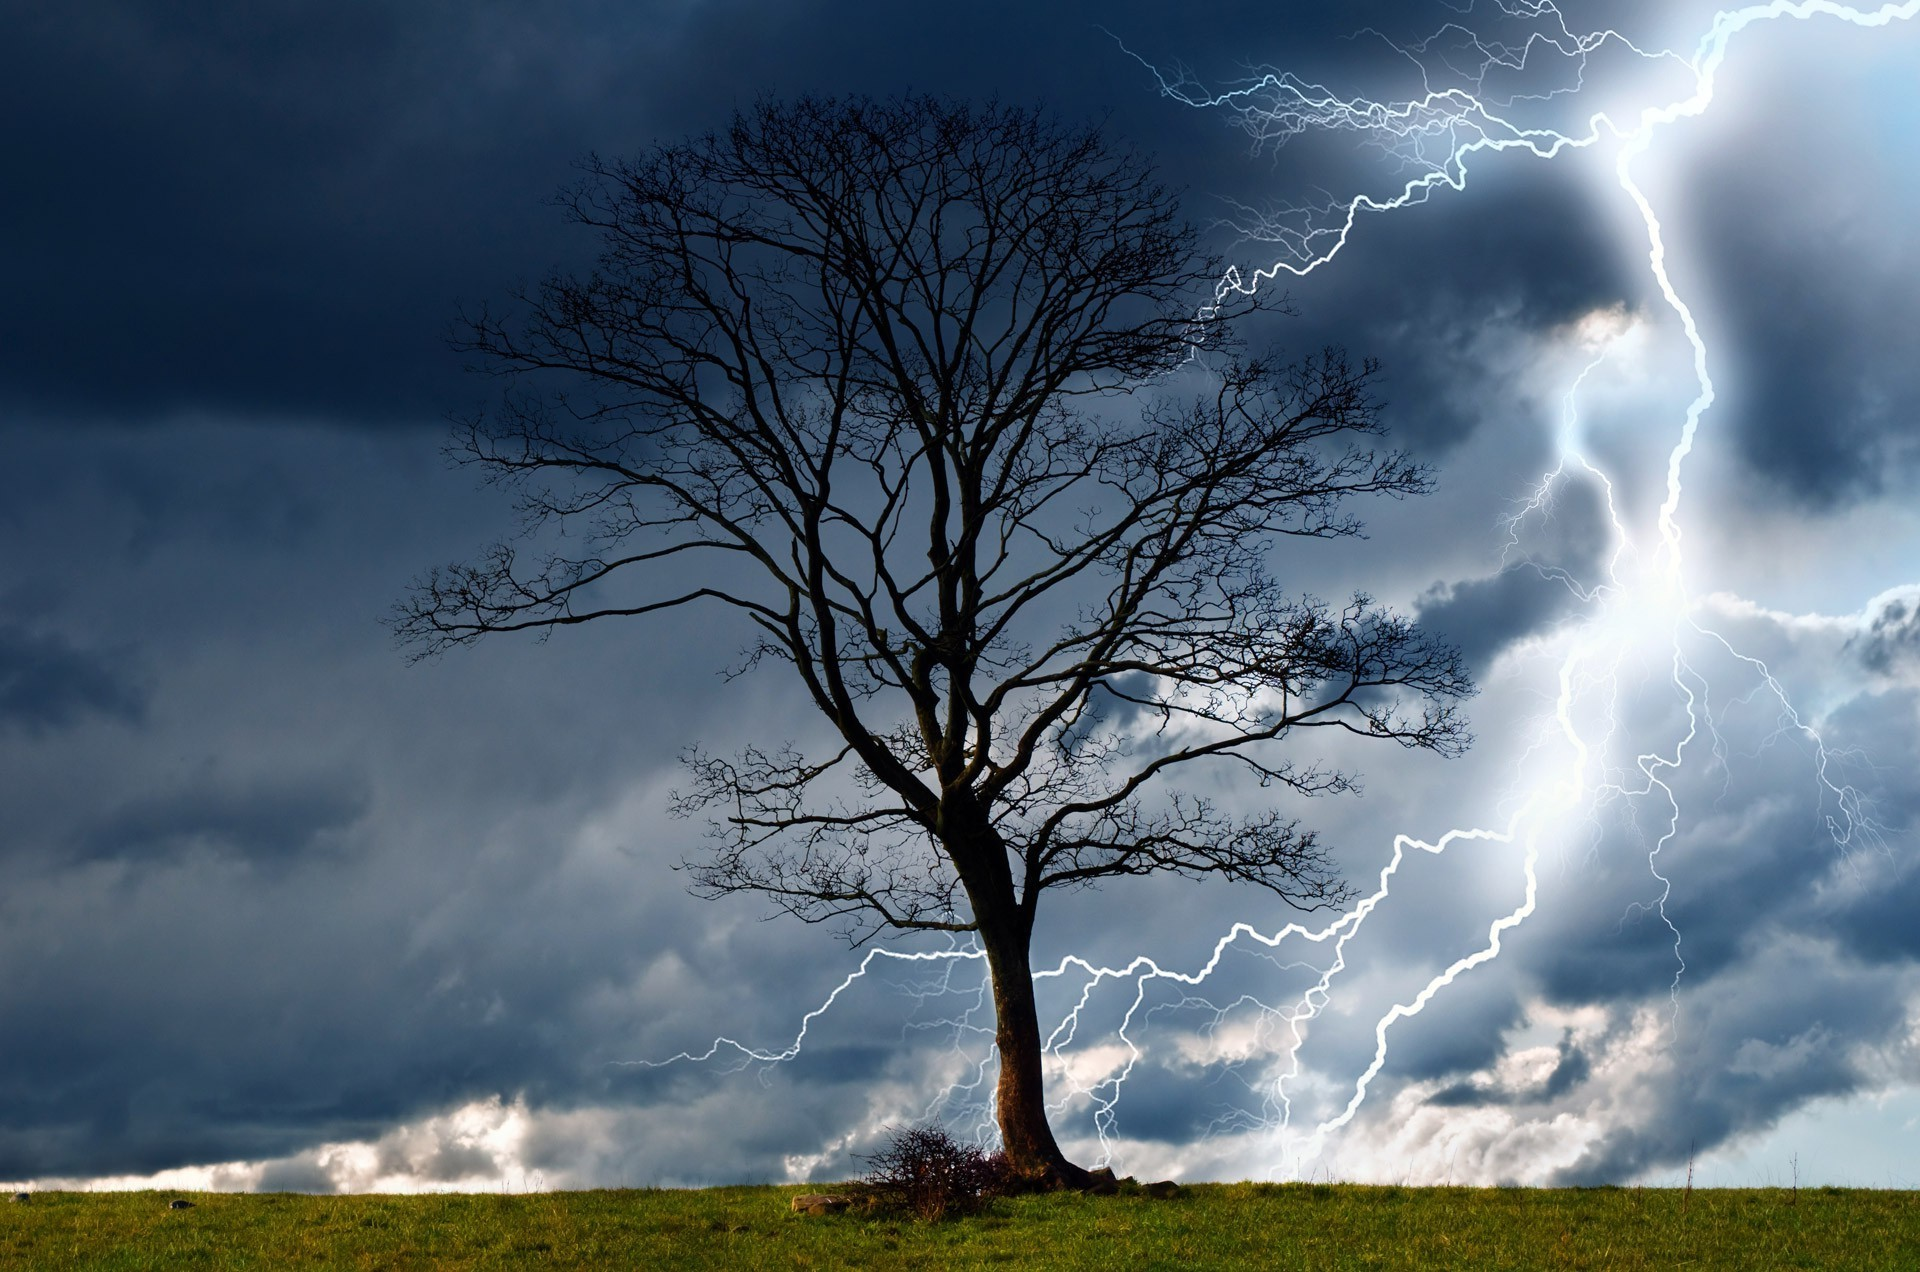 trees, Storm, Sky, Lightning, Rain, Nature, Dangerous, Wind, Wet, Elements,  Landscape Wallpapers HD / Desktop and Mobile Backgrounds